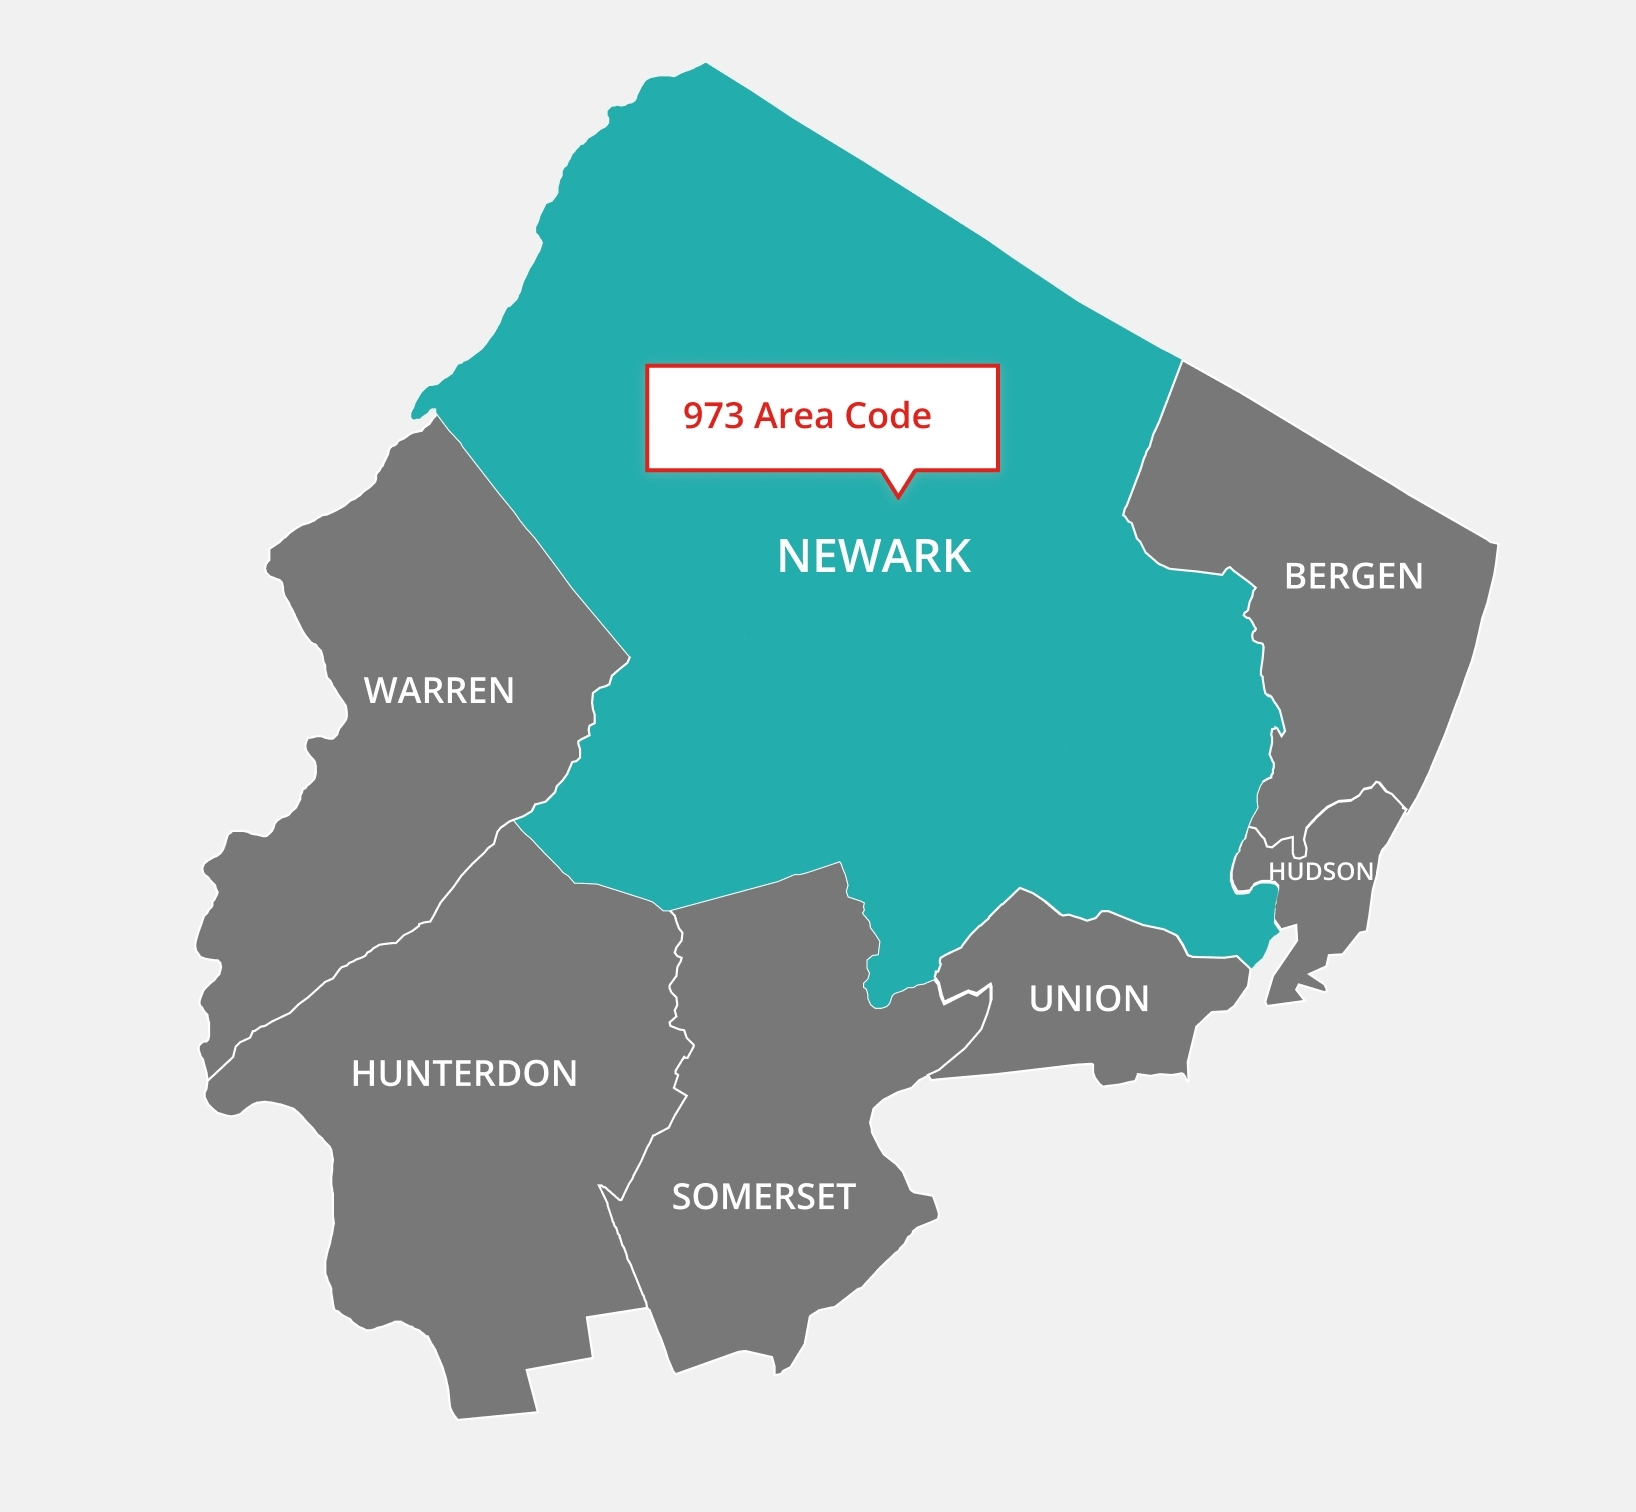 973 area code location